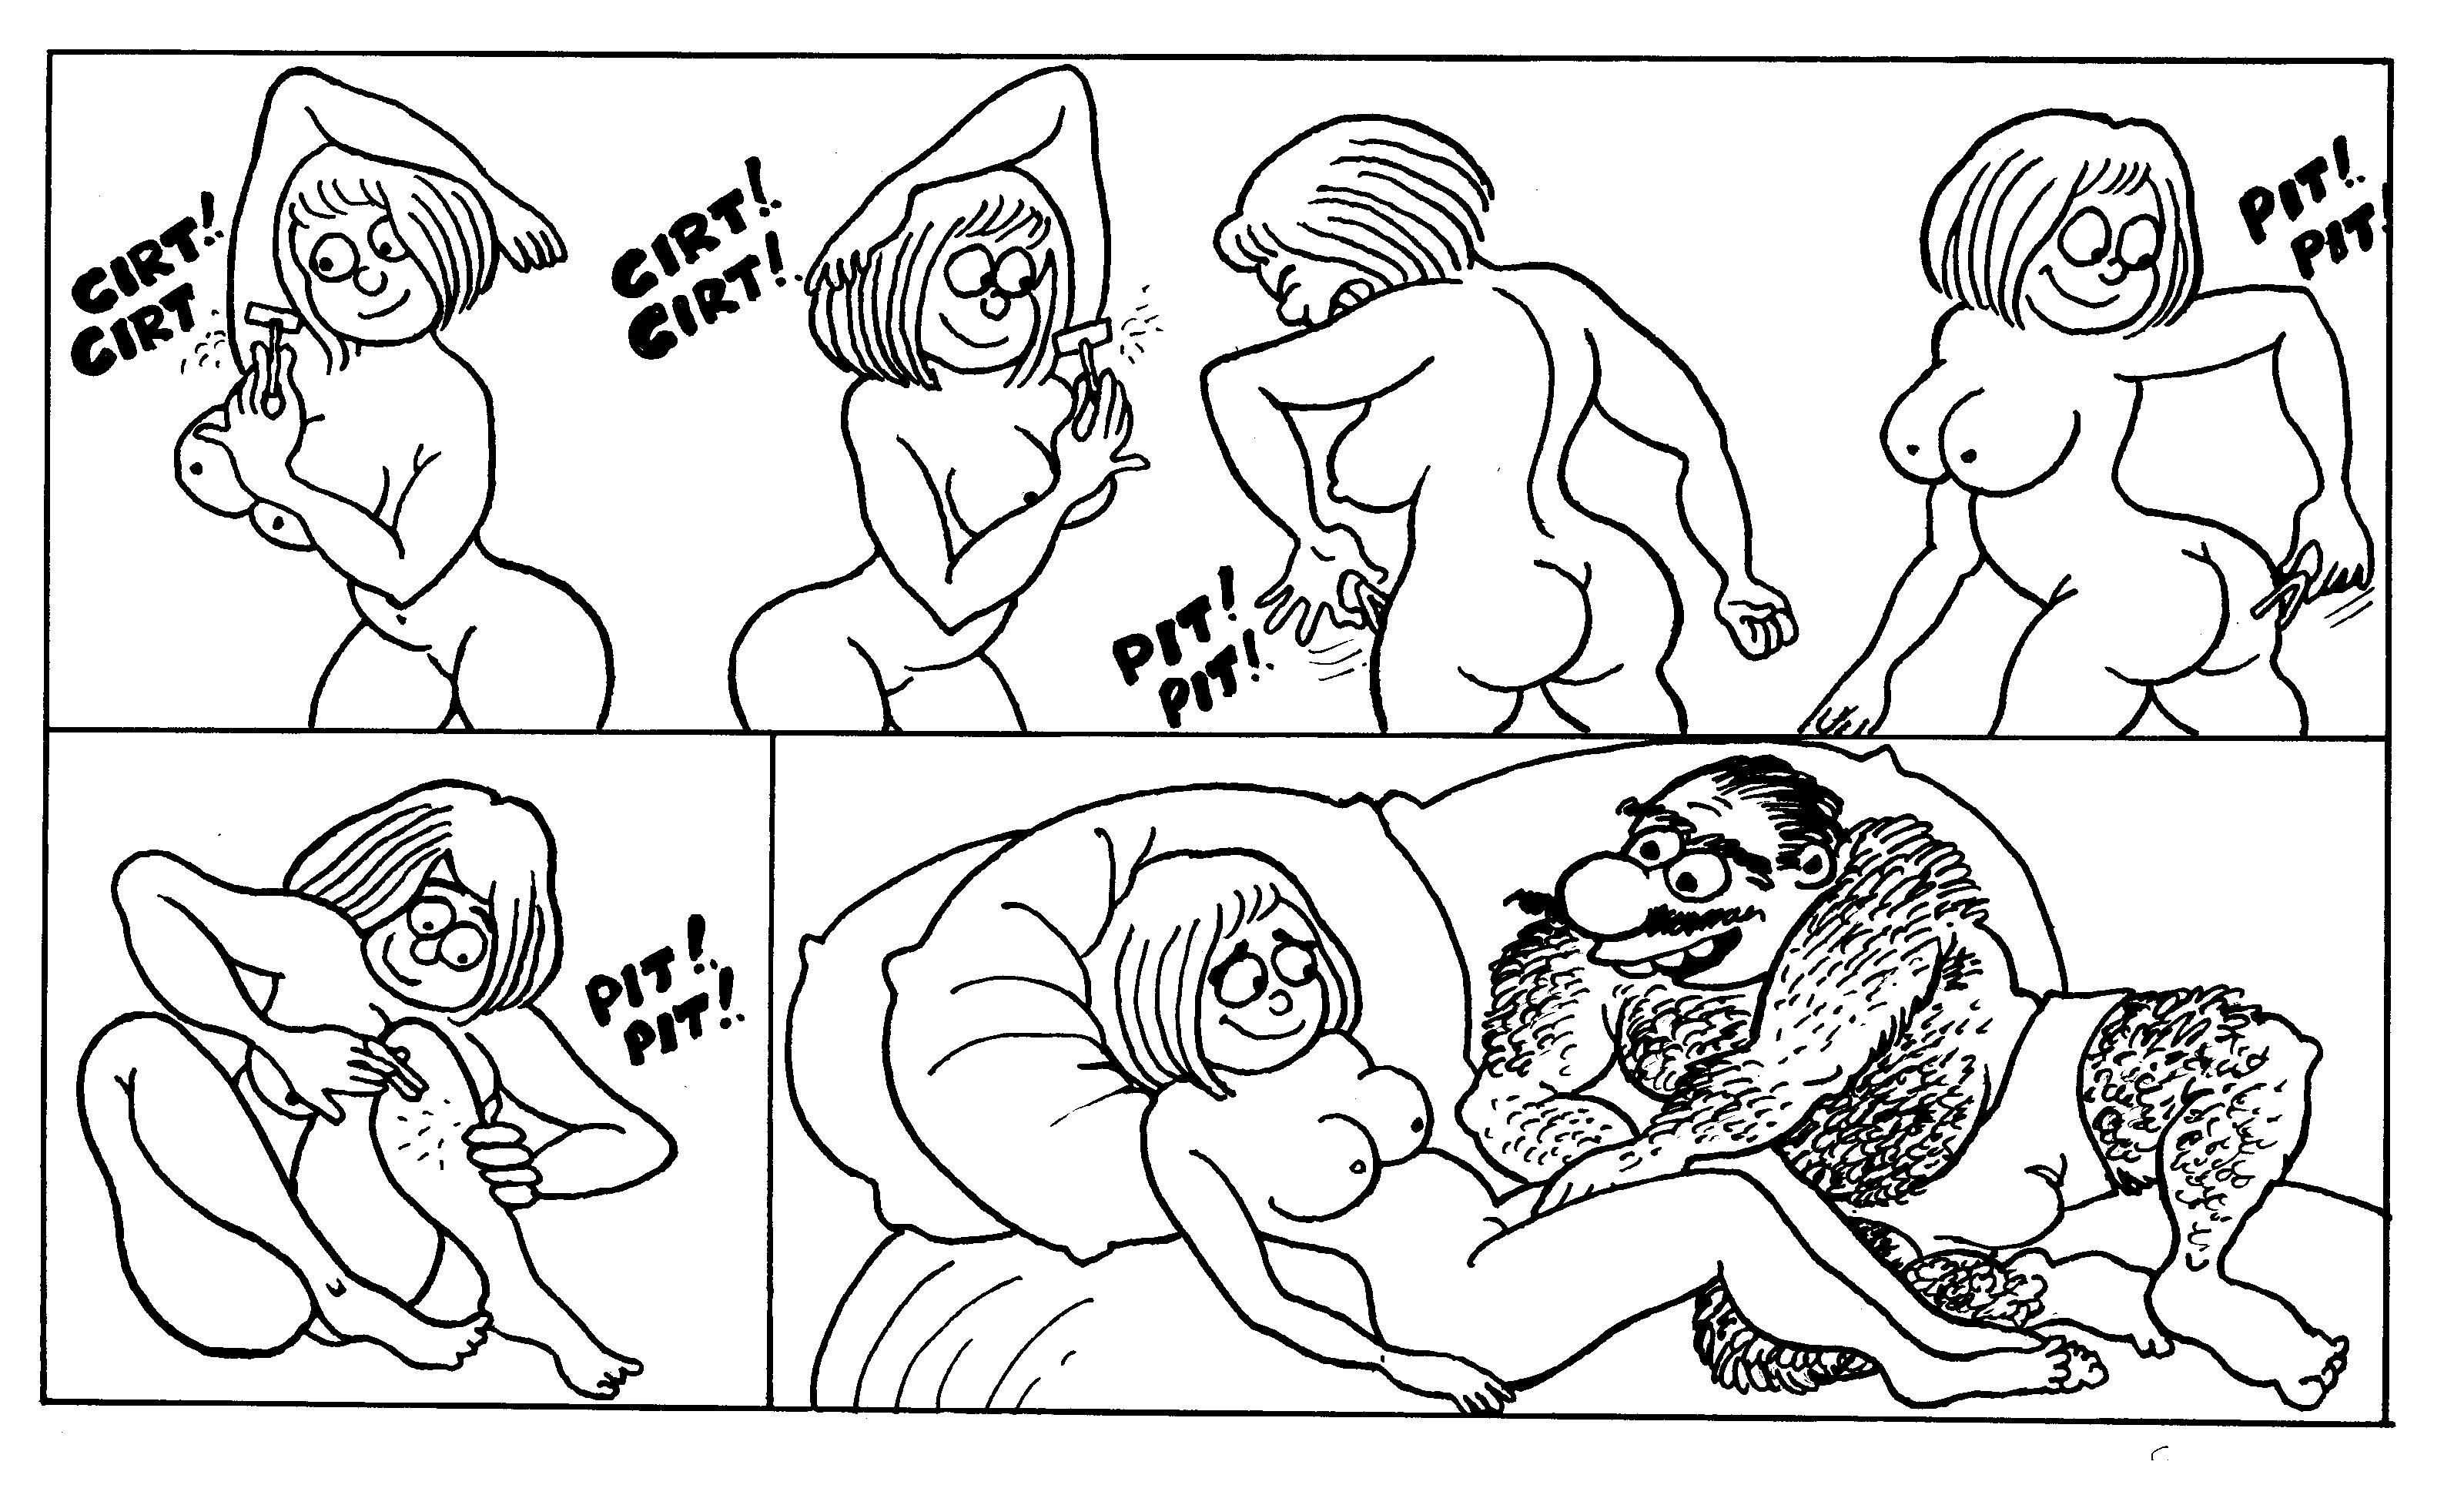 RAMIZE-ERRER-cartoonist-3